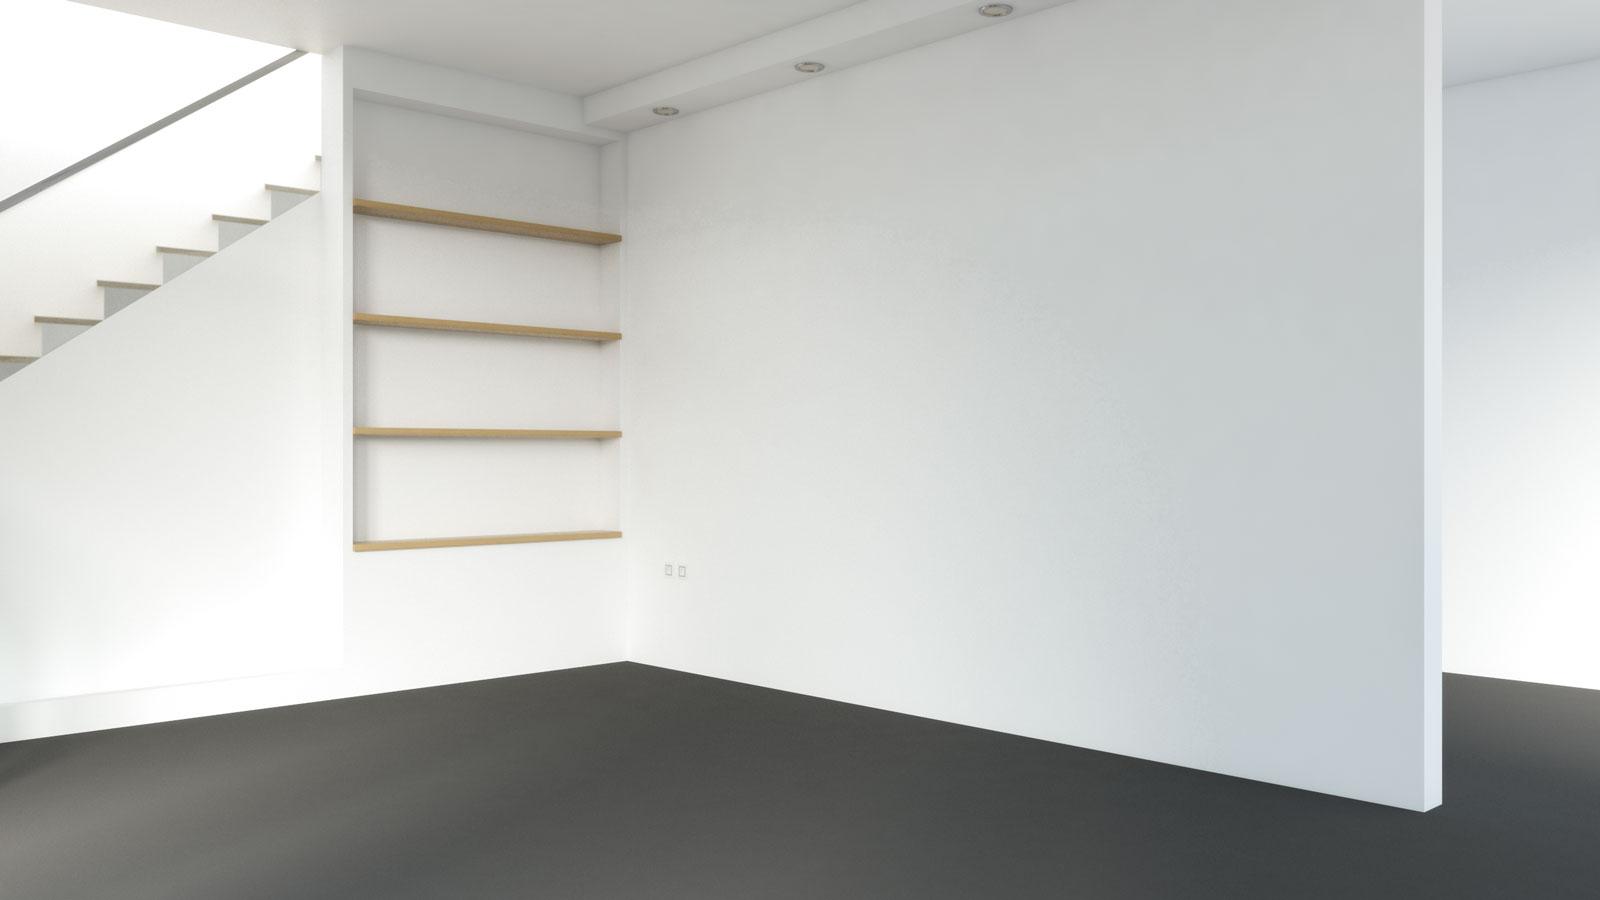 Black carpet with white walls